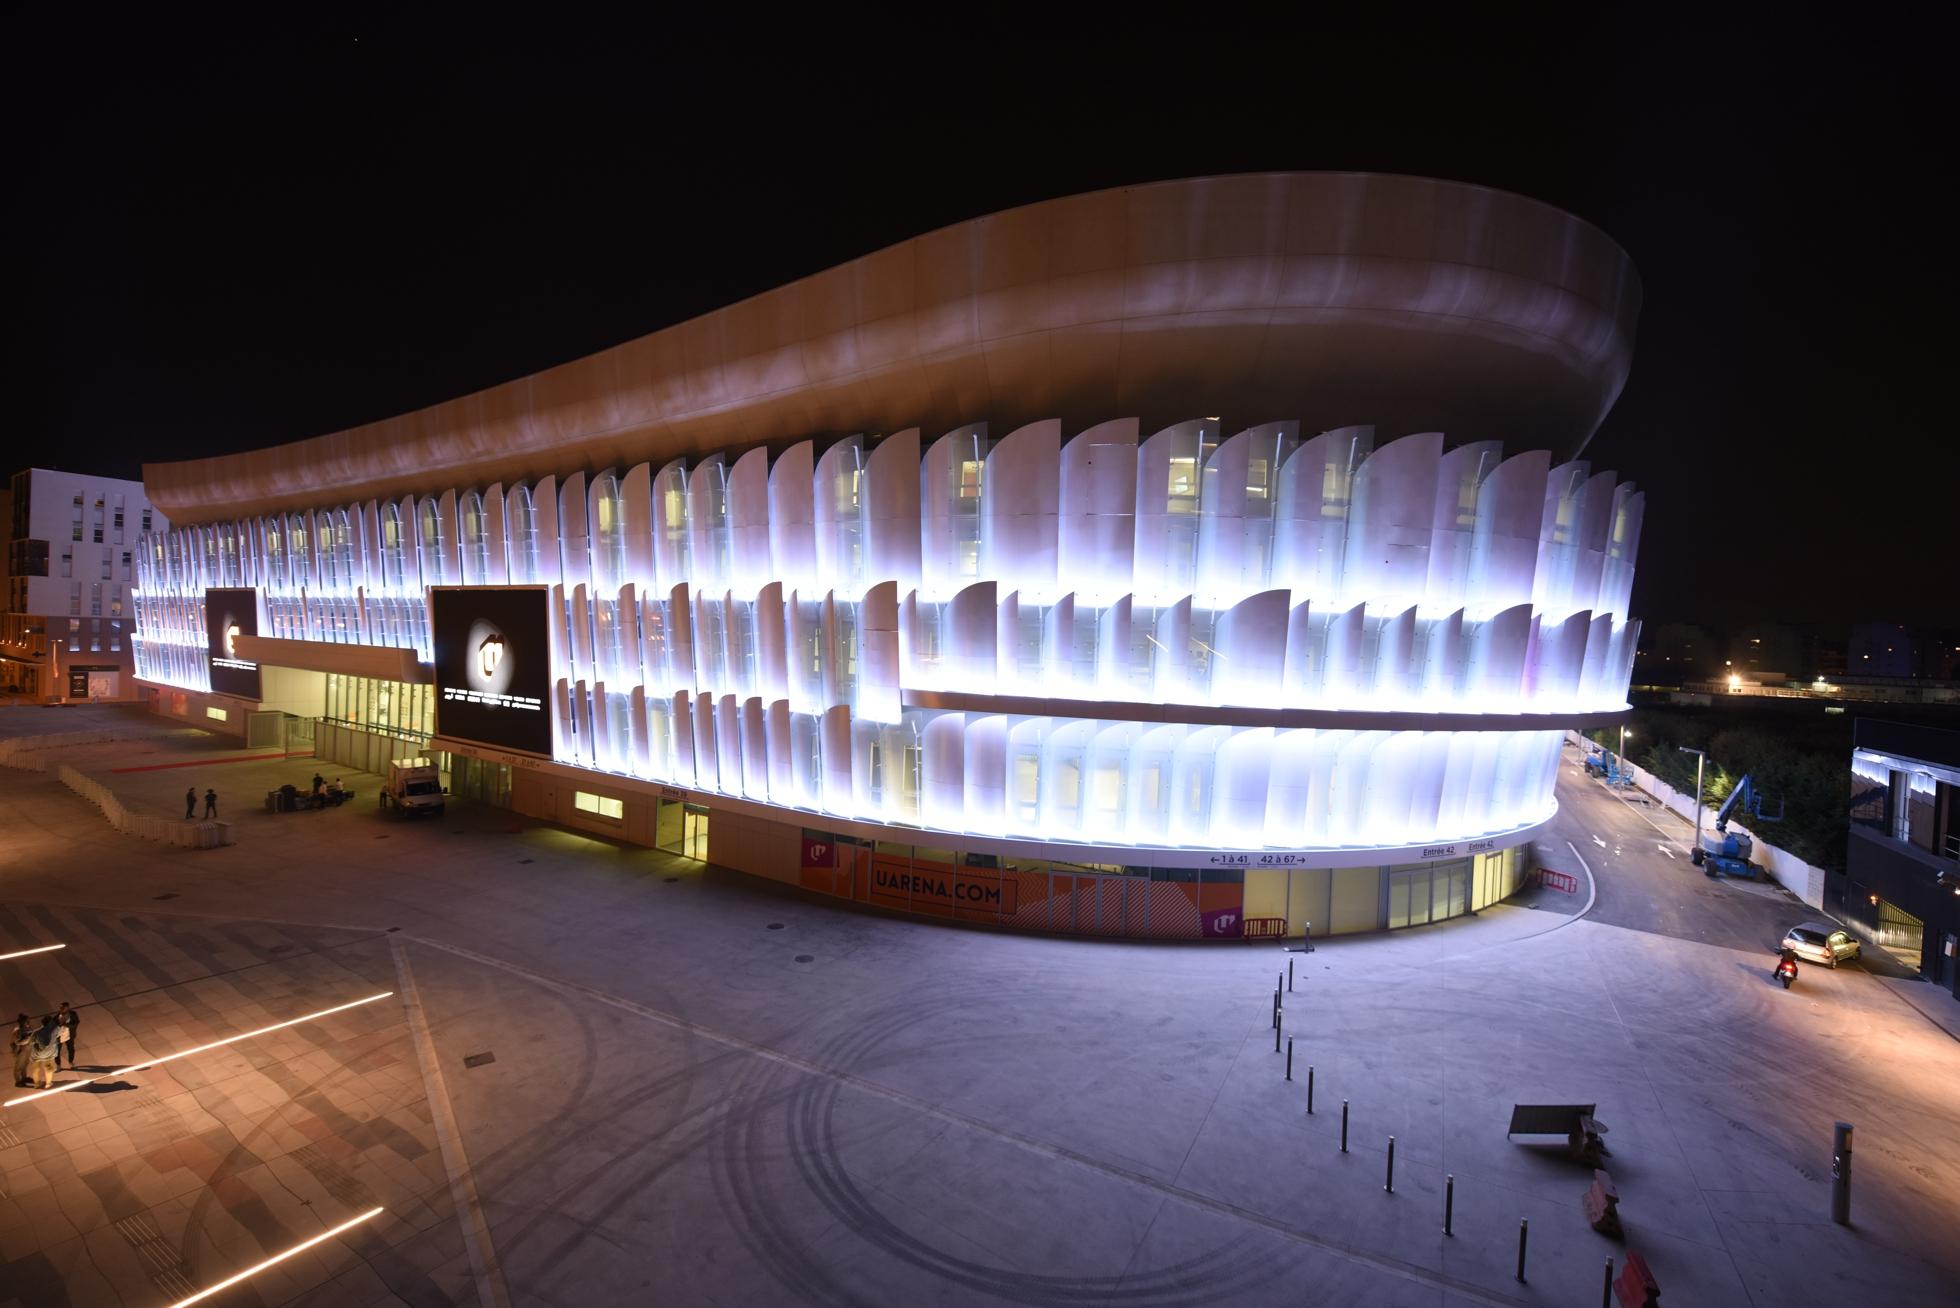 Enceinte ultra moderne la u arena a enfin t inaugur e for Interieur u arena